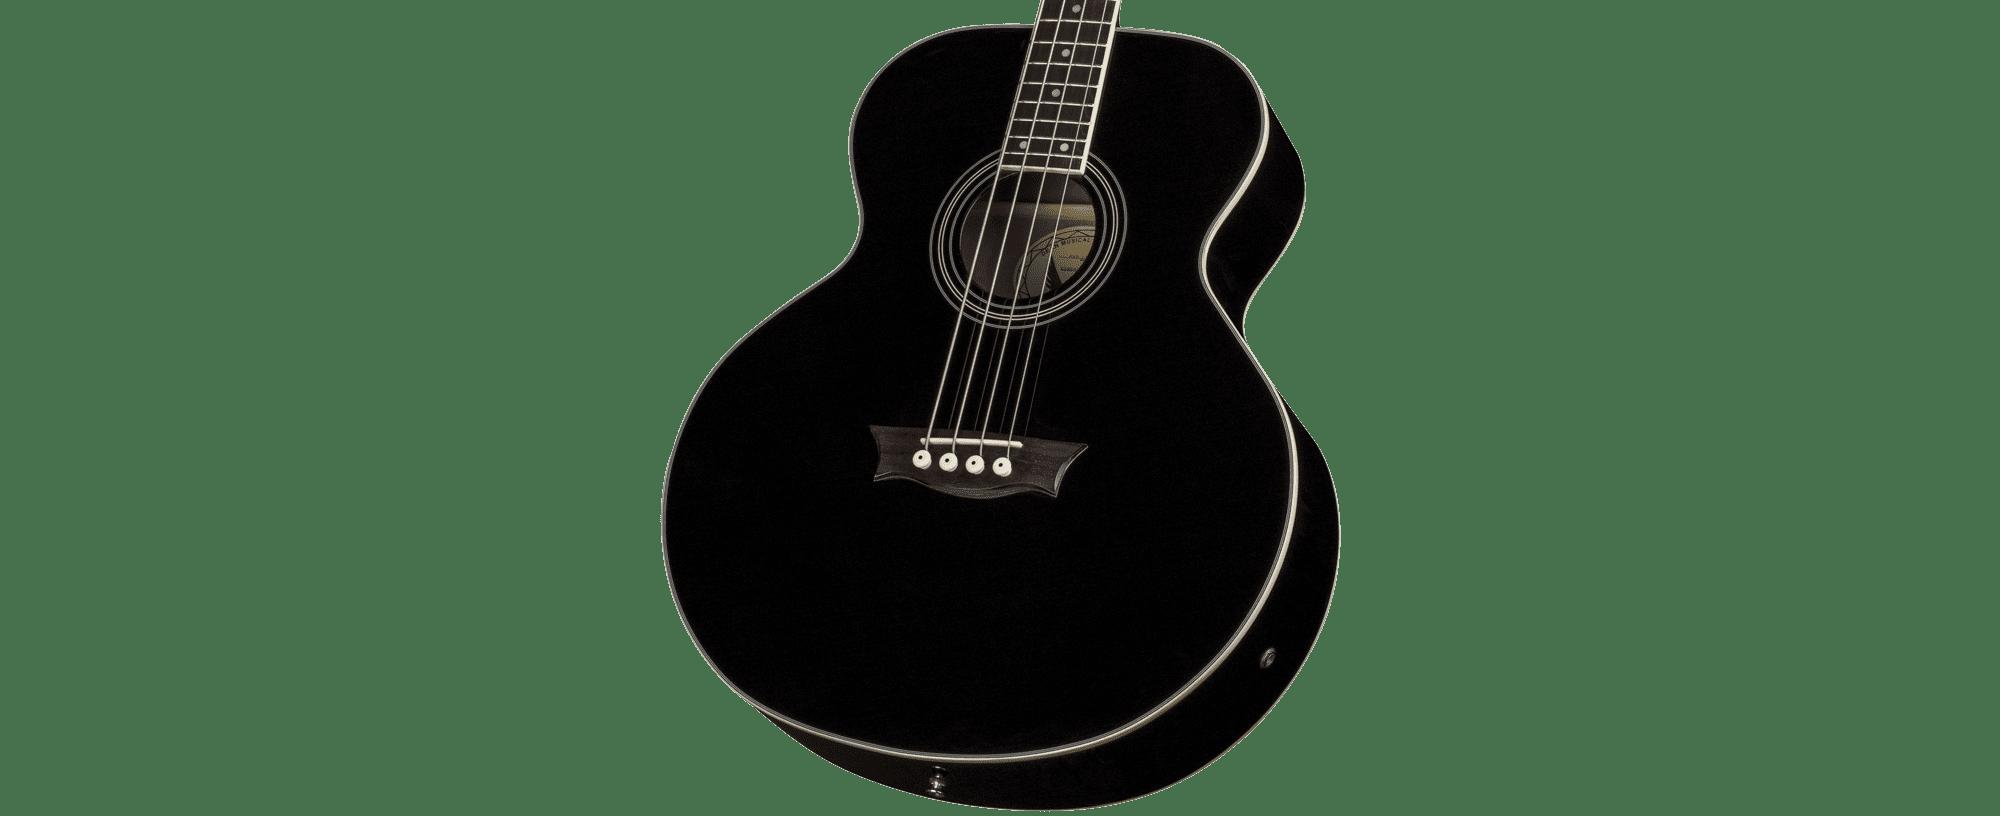 Dean Bass Guitar Wiring Diagram Acoustic Electric Classic Black Guitars Image